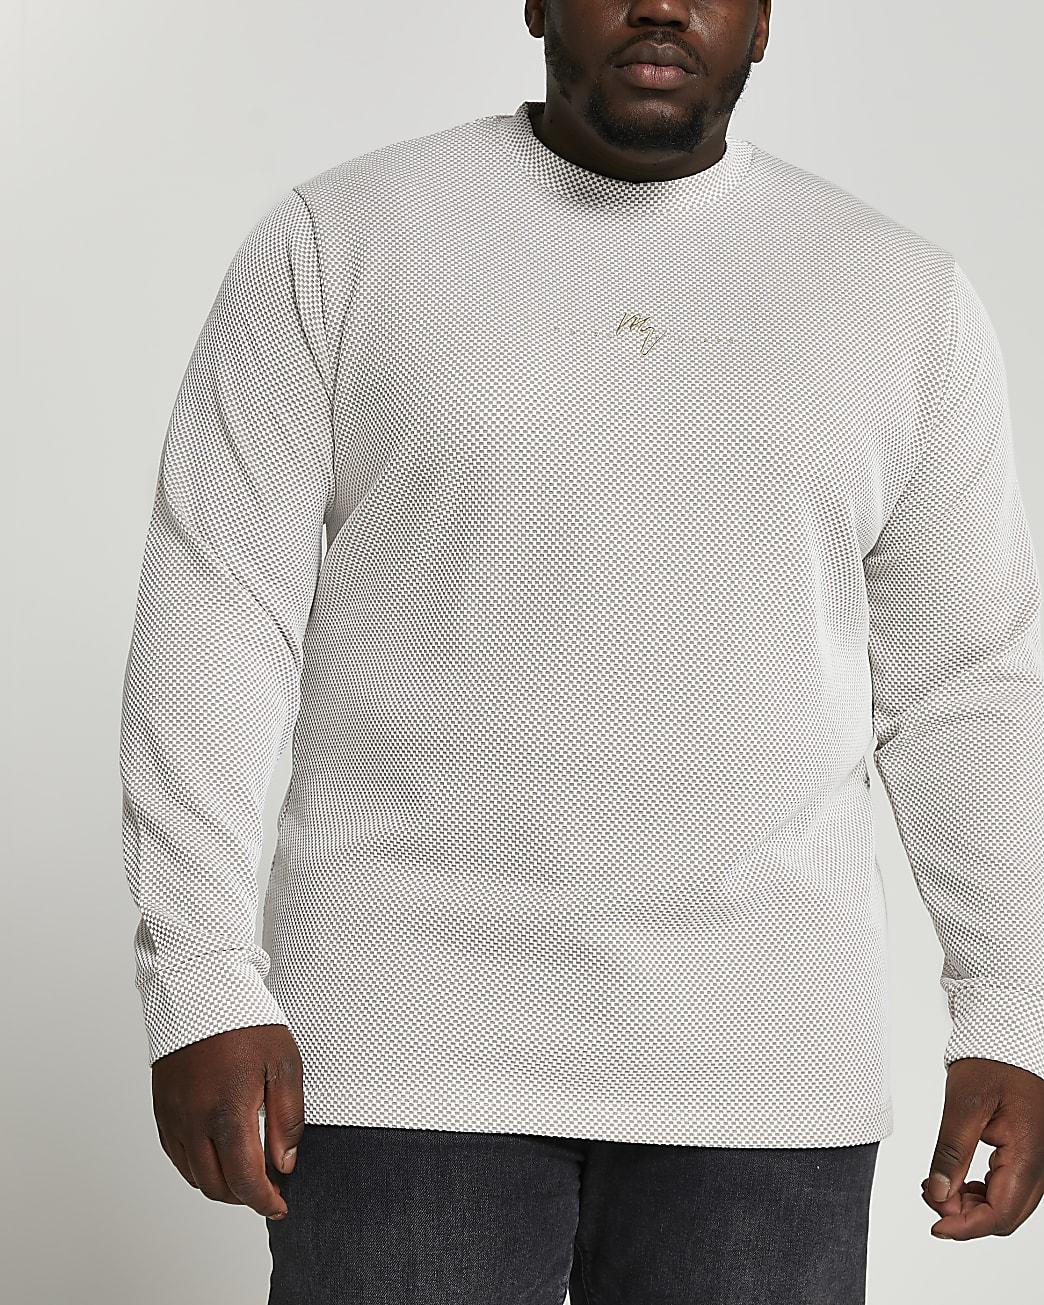 Big & Tall Maison Riviera ecru sweatshirt